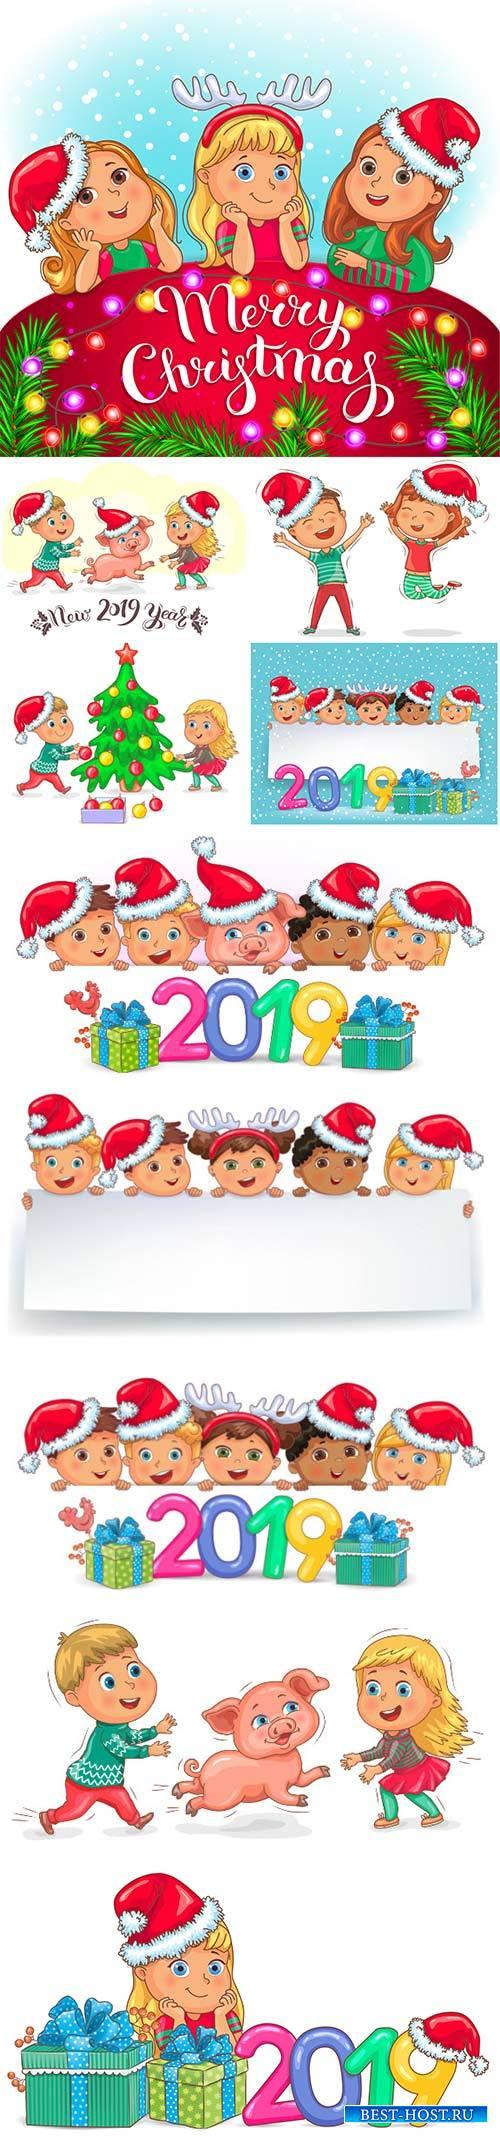 Cute kids and little piggy new year 2019